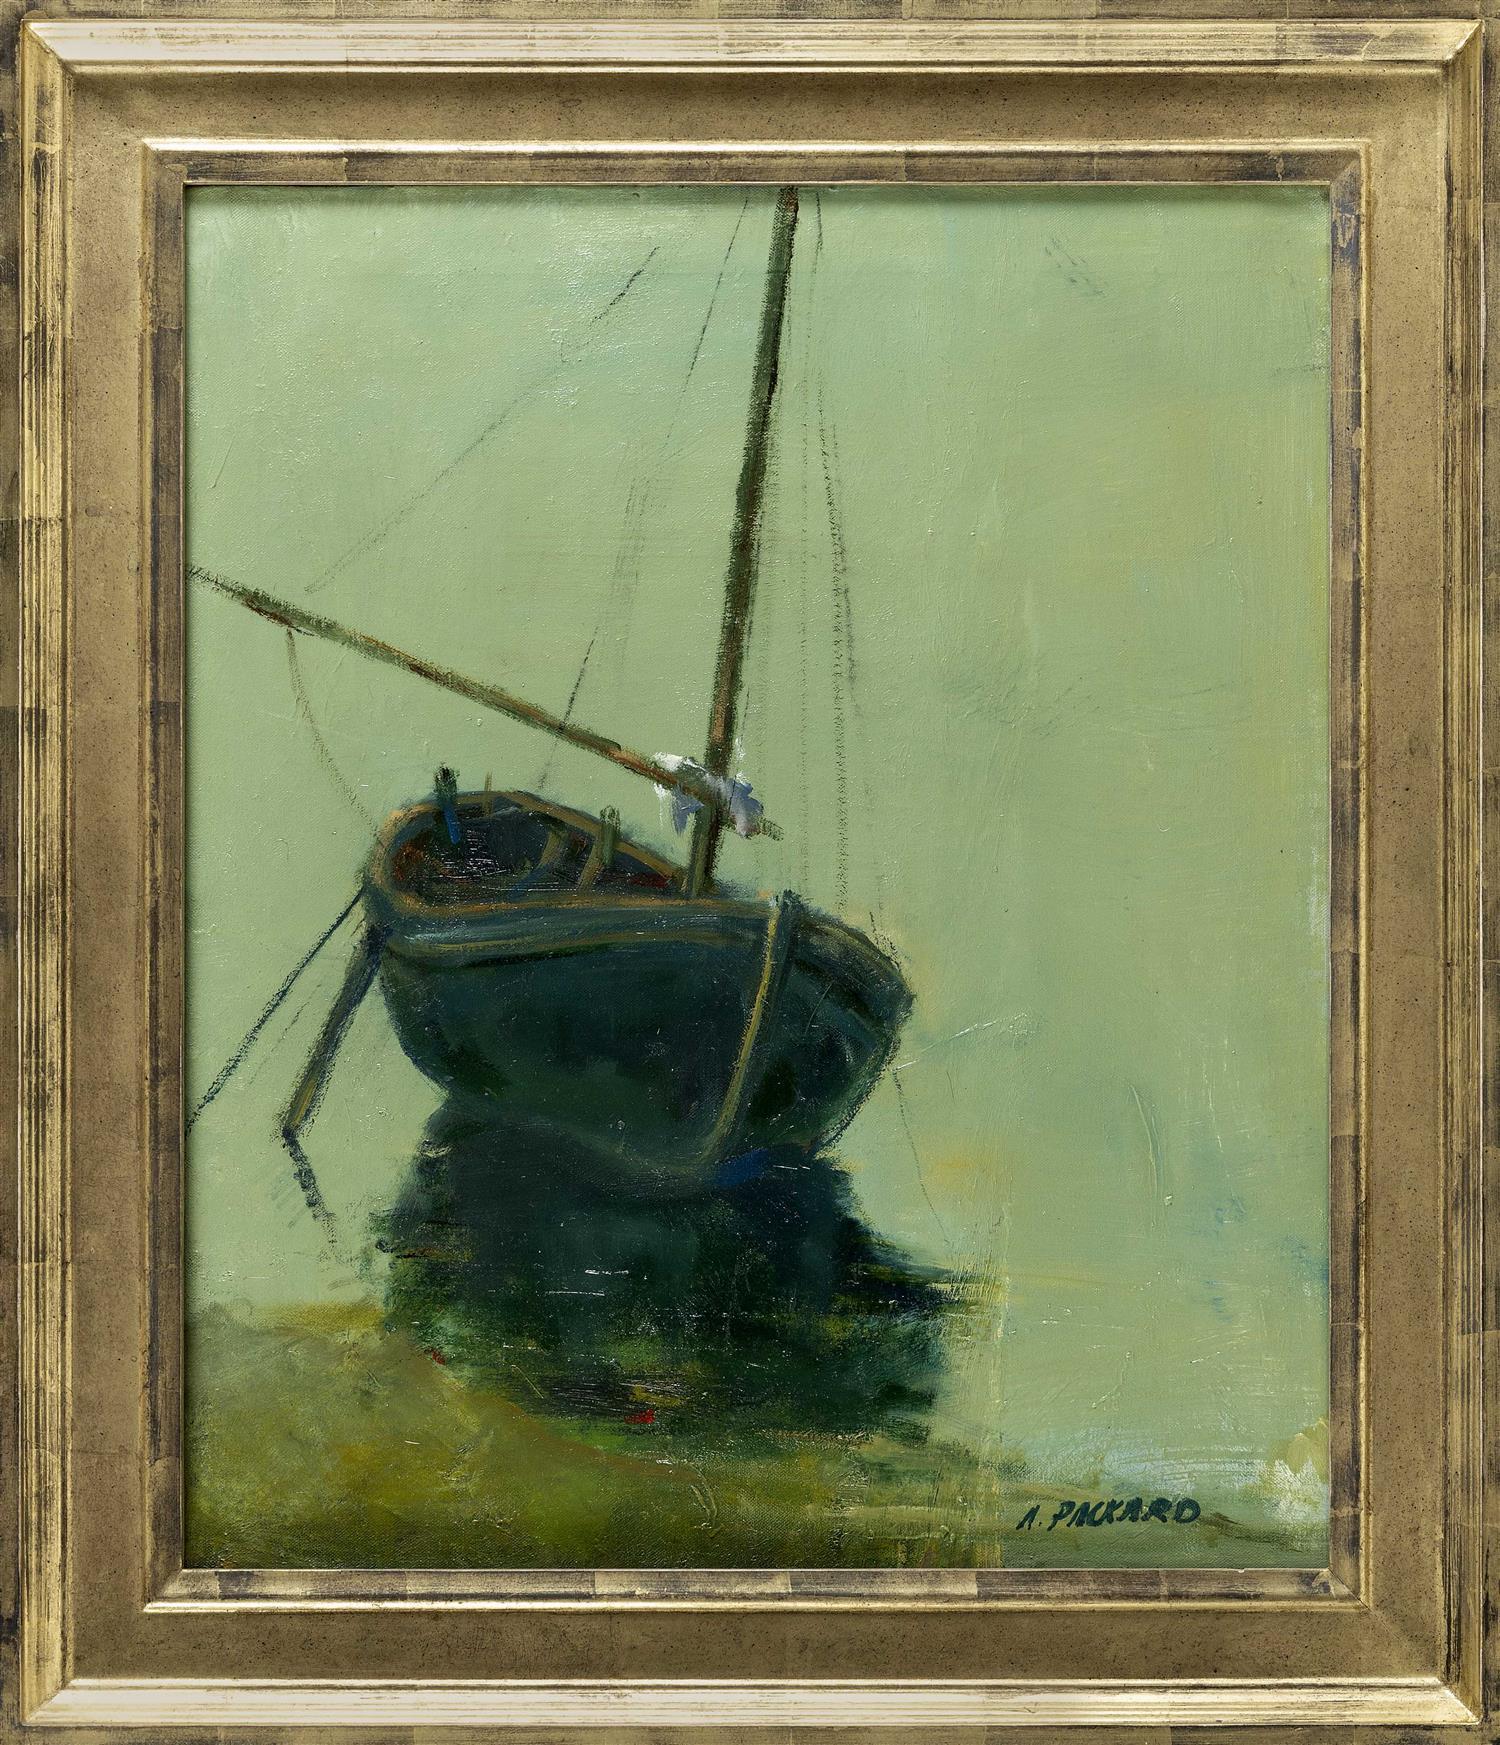 "ANNE PACKARD, Massachusetts/New Jersey, b. 1933, Sailboat., Oil on canvas, 24"" x 20"". Framed 30"" x 25""."